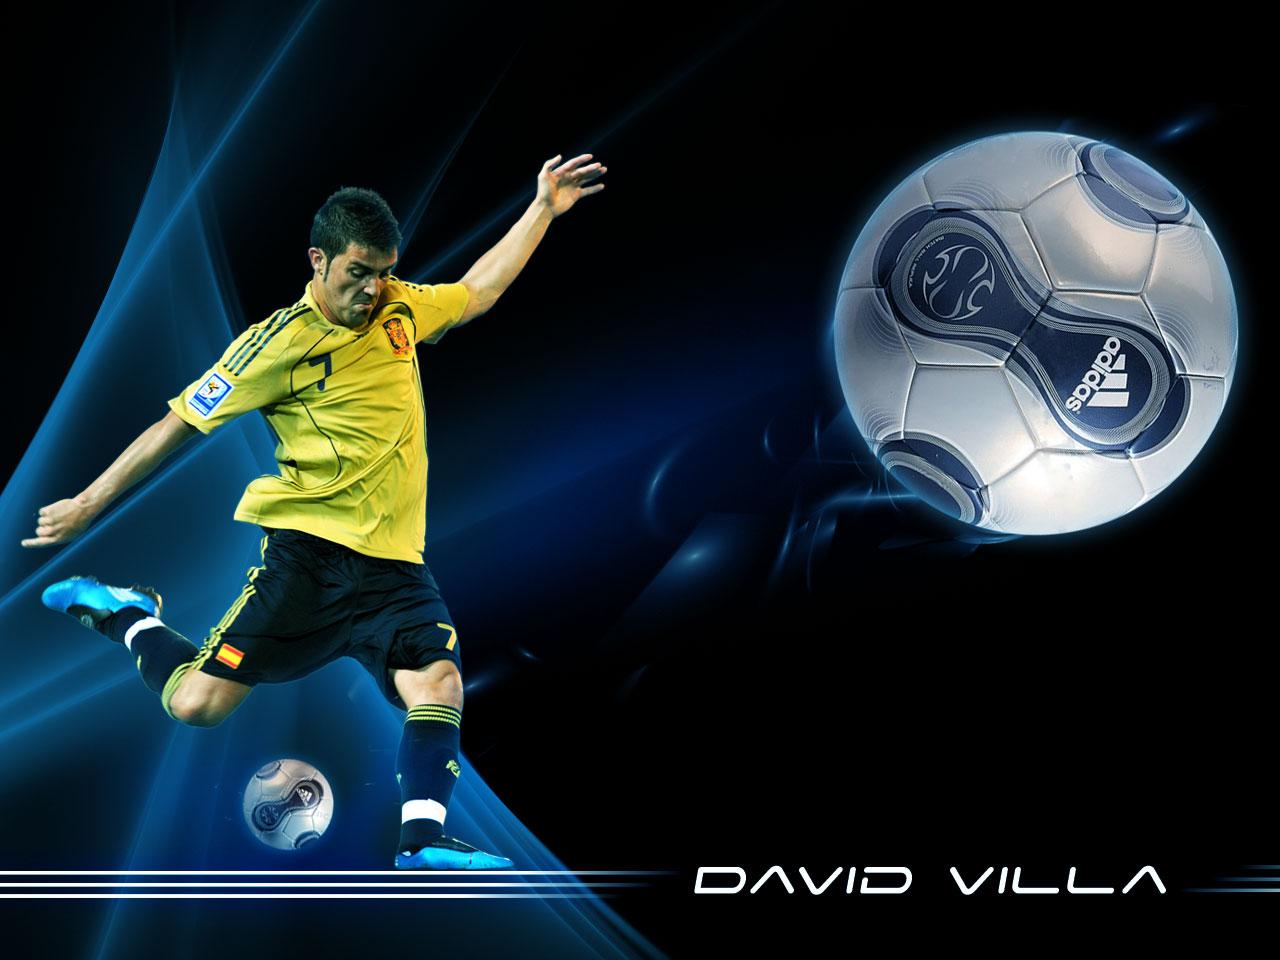 http://3.bp.blogspot.com/-5KG5UHCH-Ac/T-WUgwW3_XI/AAAAAAAAGDw/EBKJOF3MaCI/s1600/david-villa-wallpapers-03.jpg